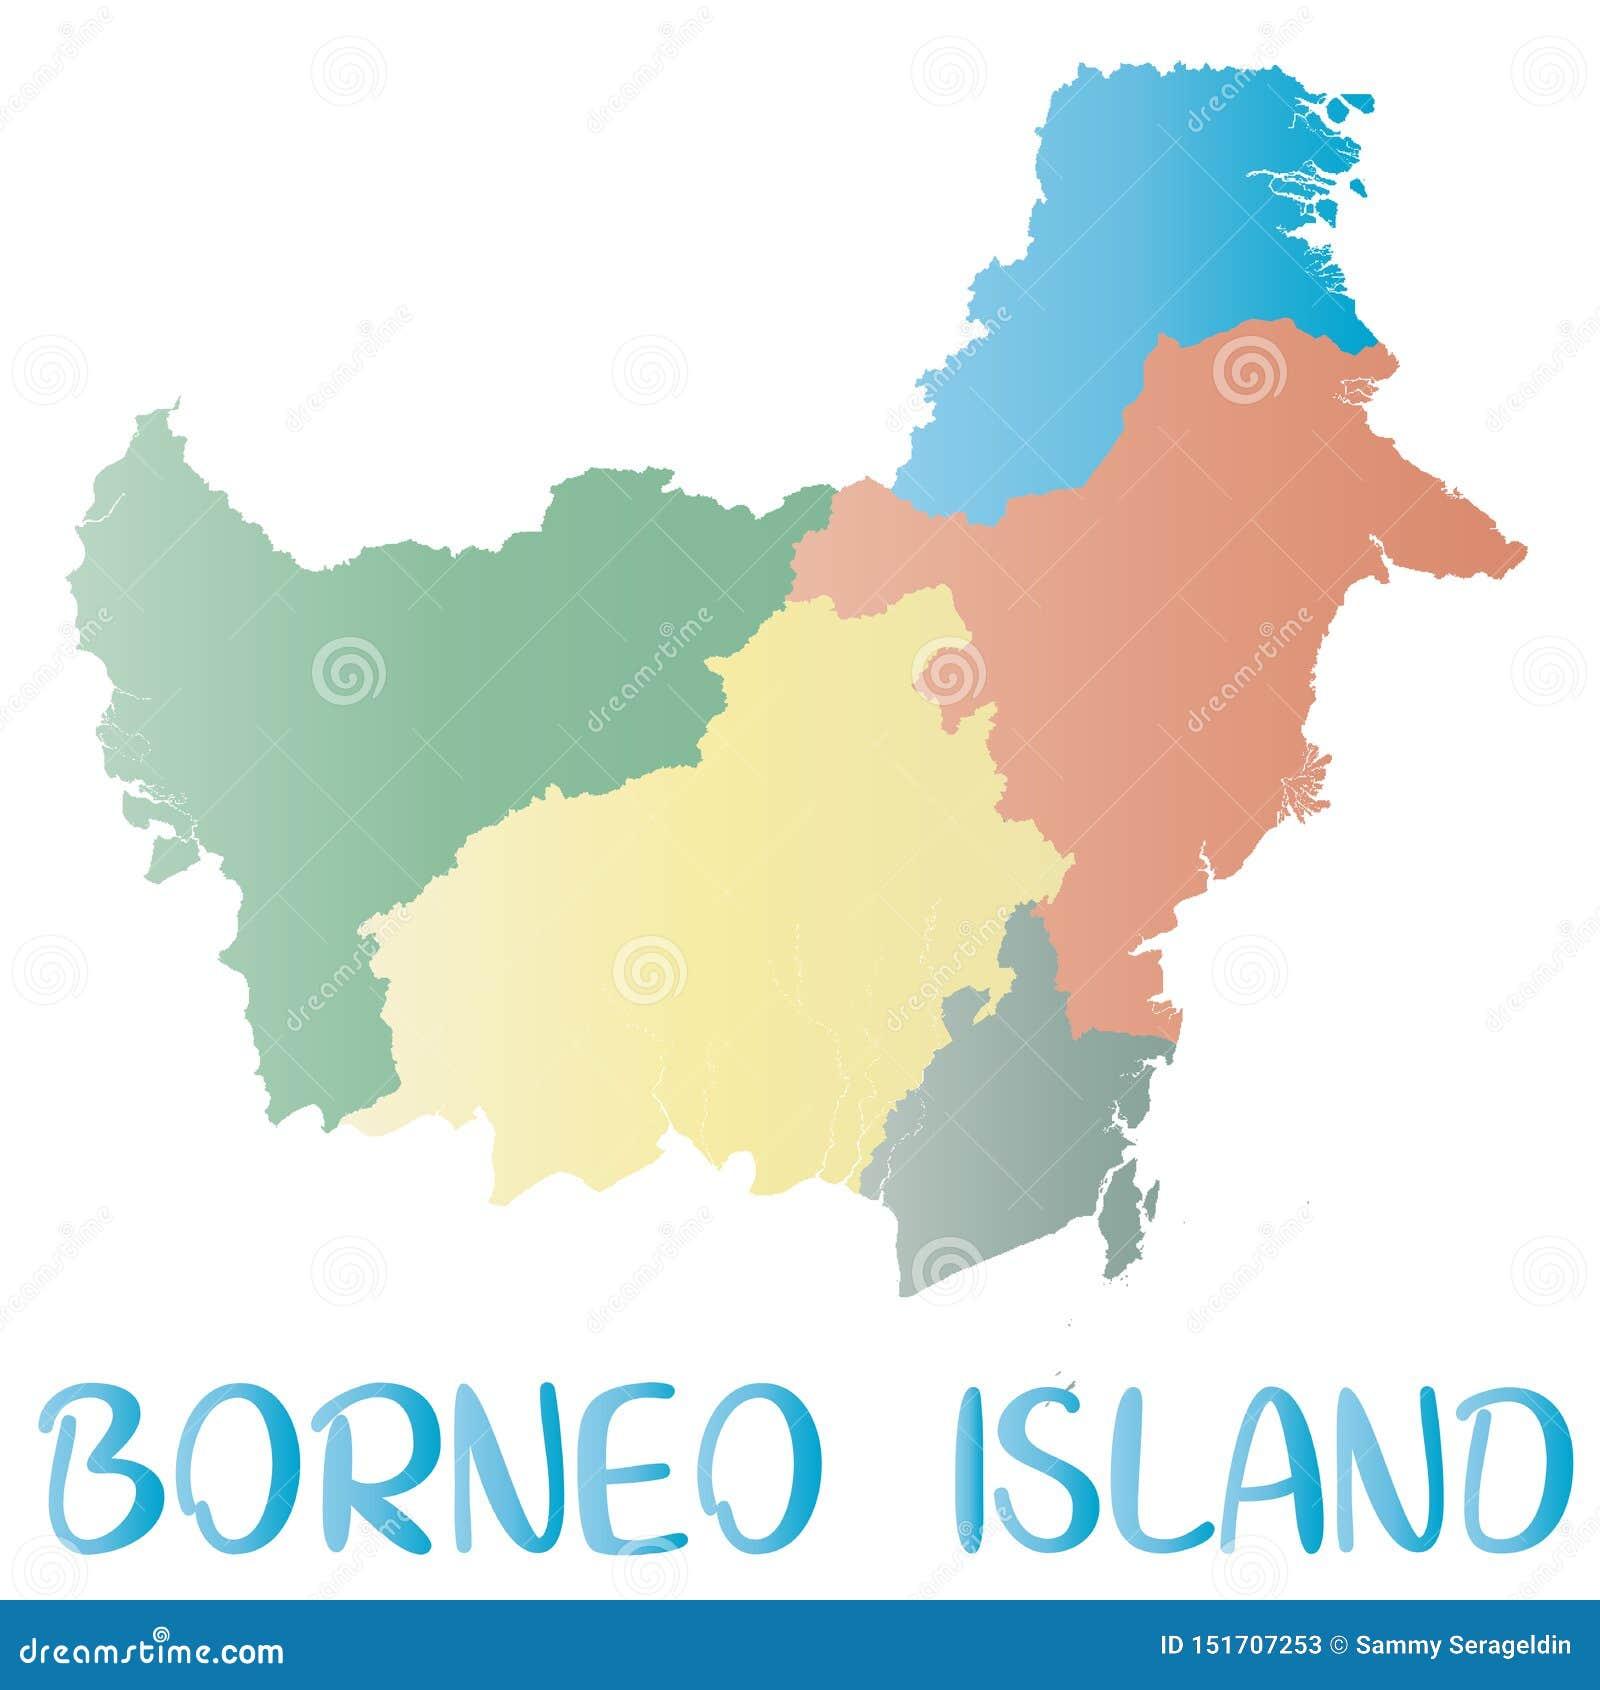 Borneo Island: Kalimantan Island Map. Islands Silhouette Icon. Isolated